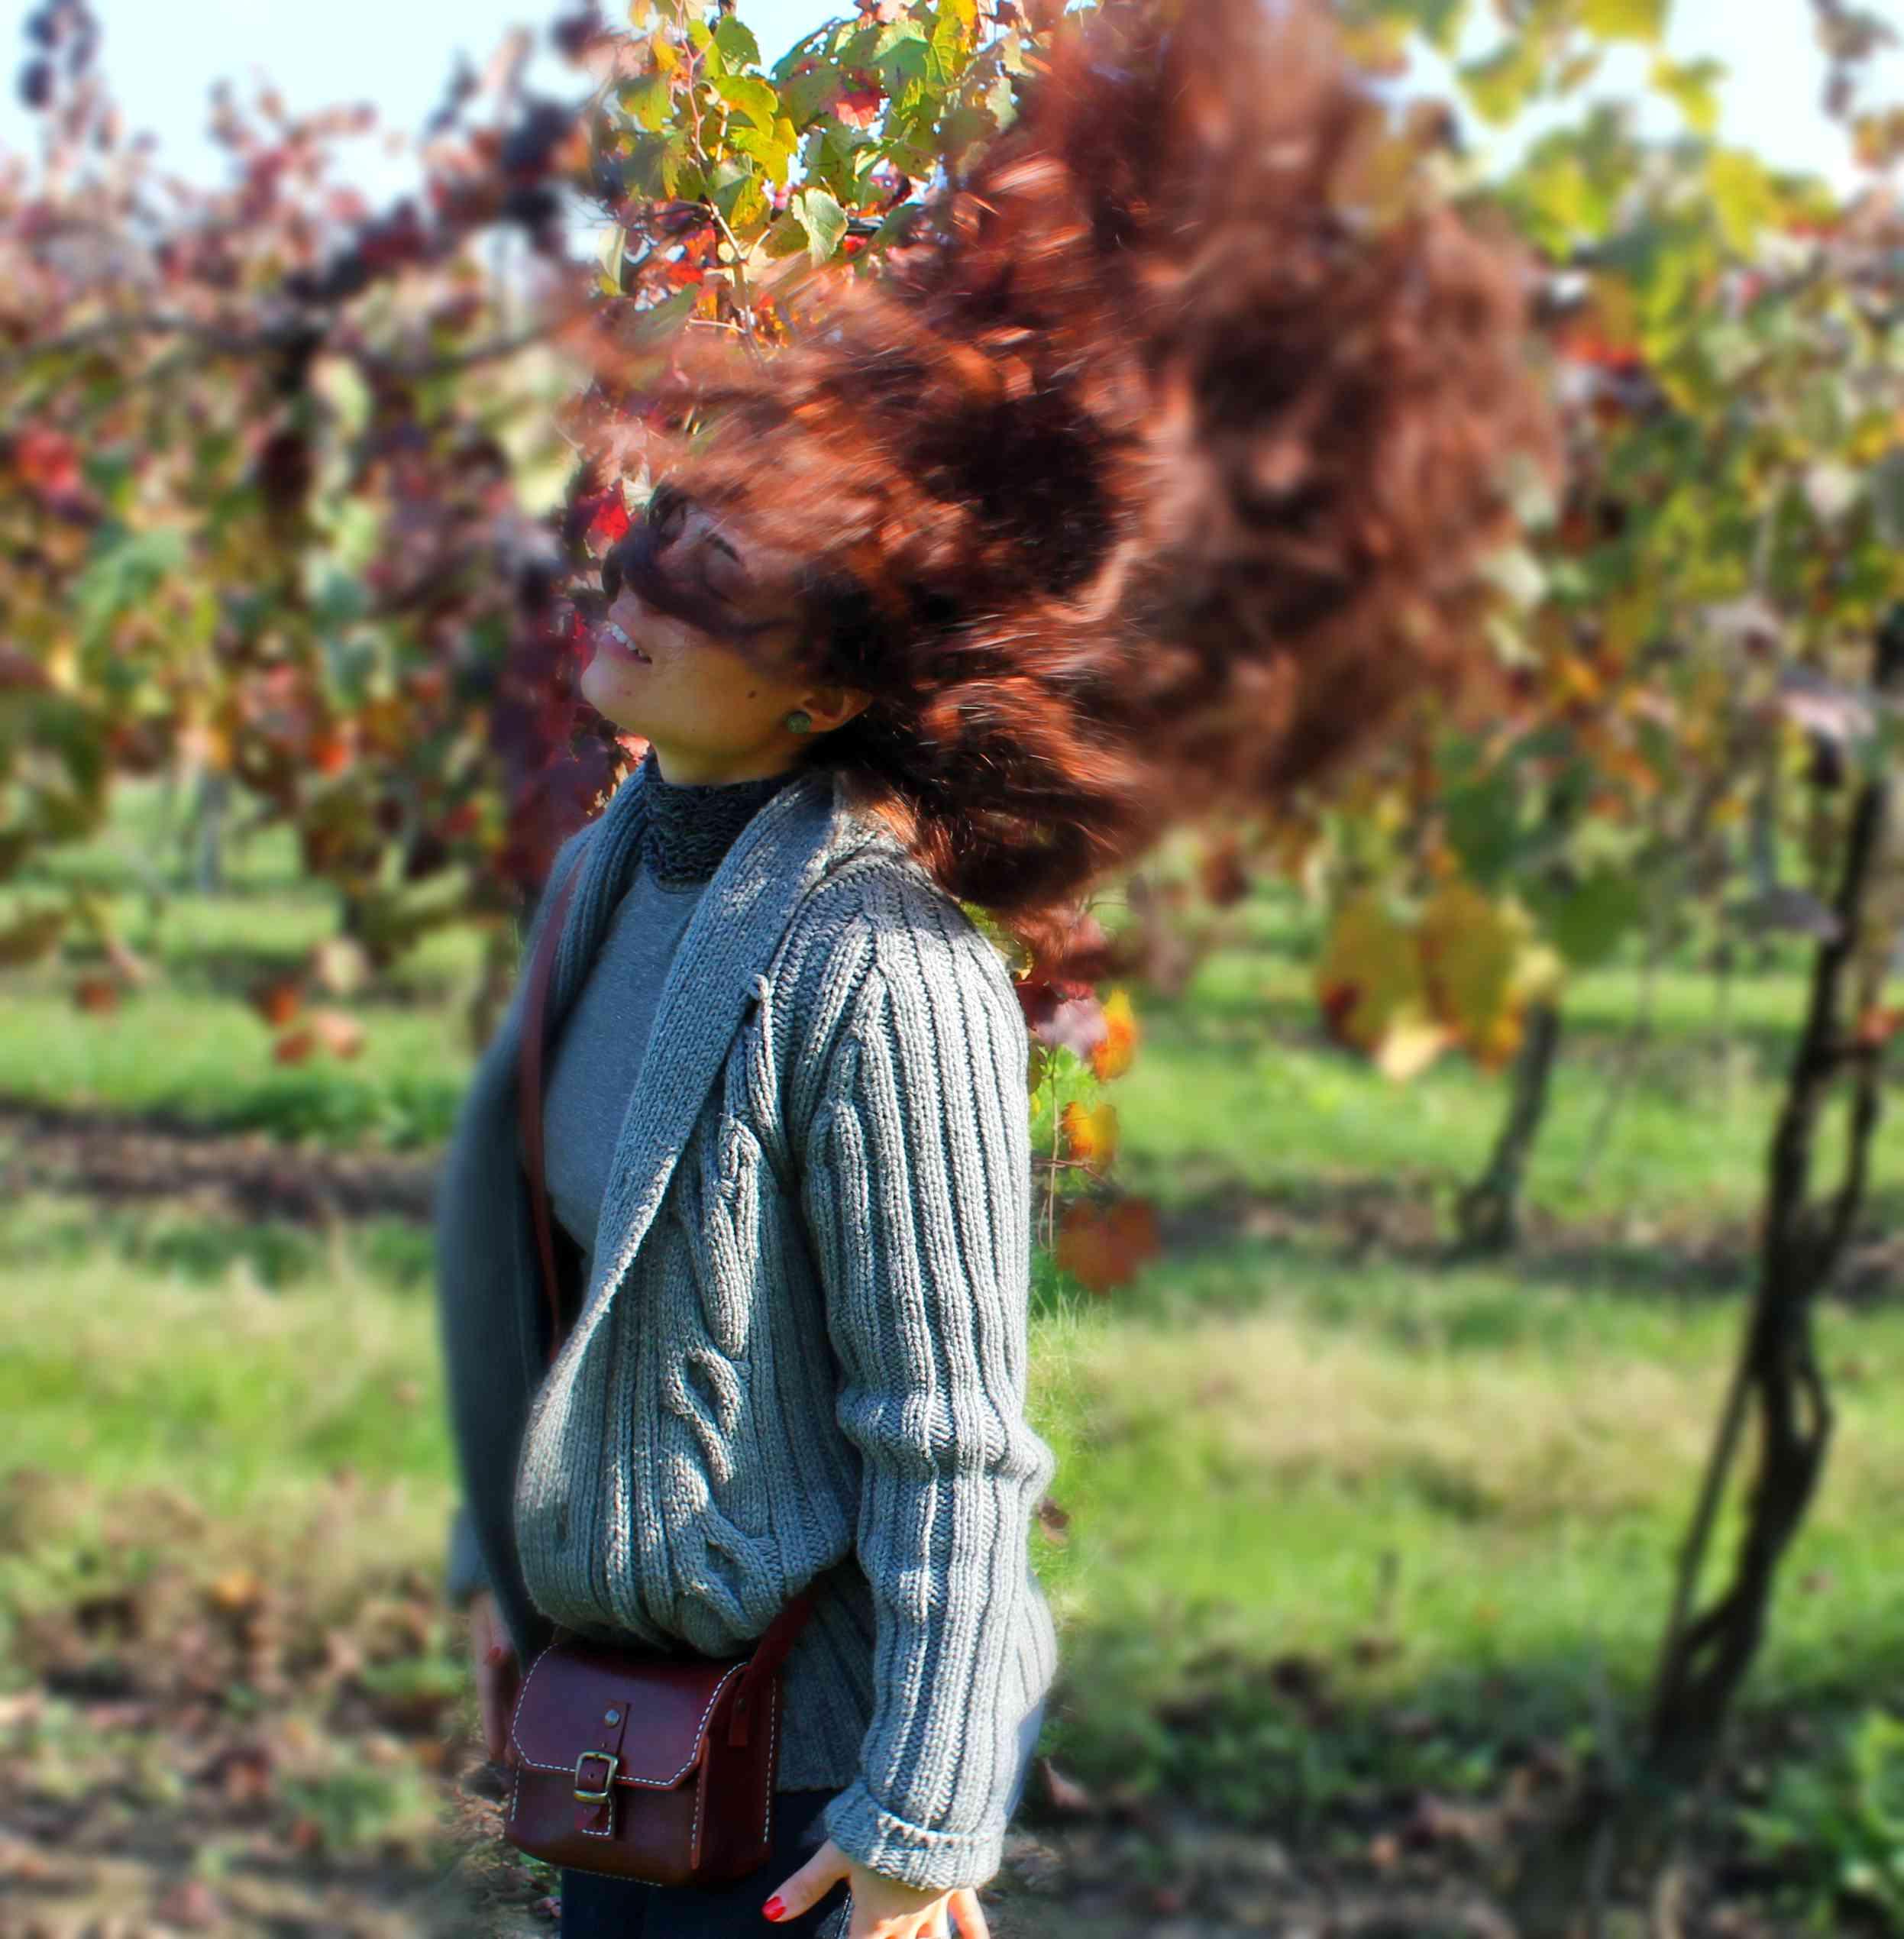 Autunno 3 #statusquoio #cuoio #bag #vigna #autumn #wave.jpg